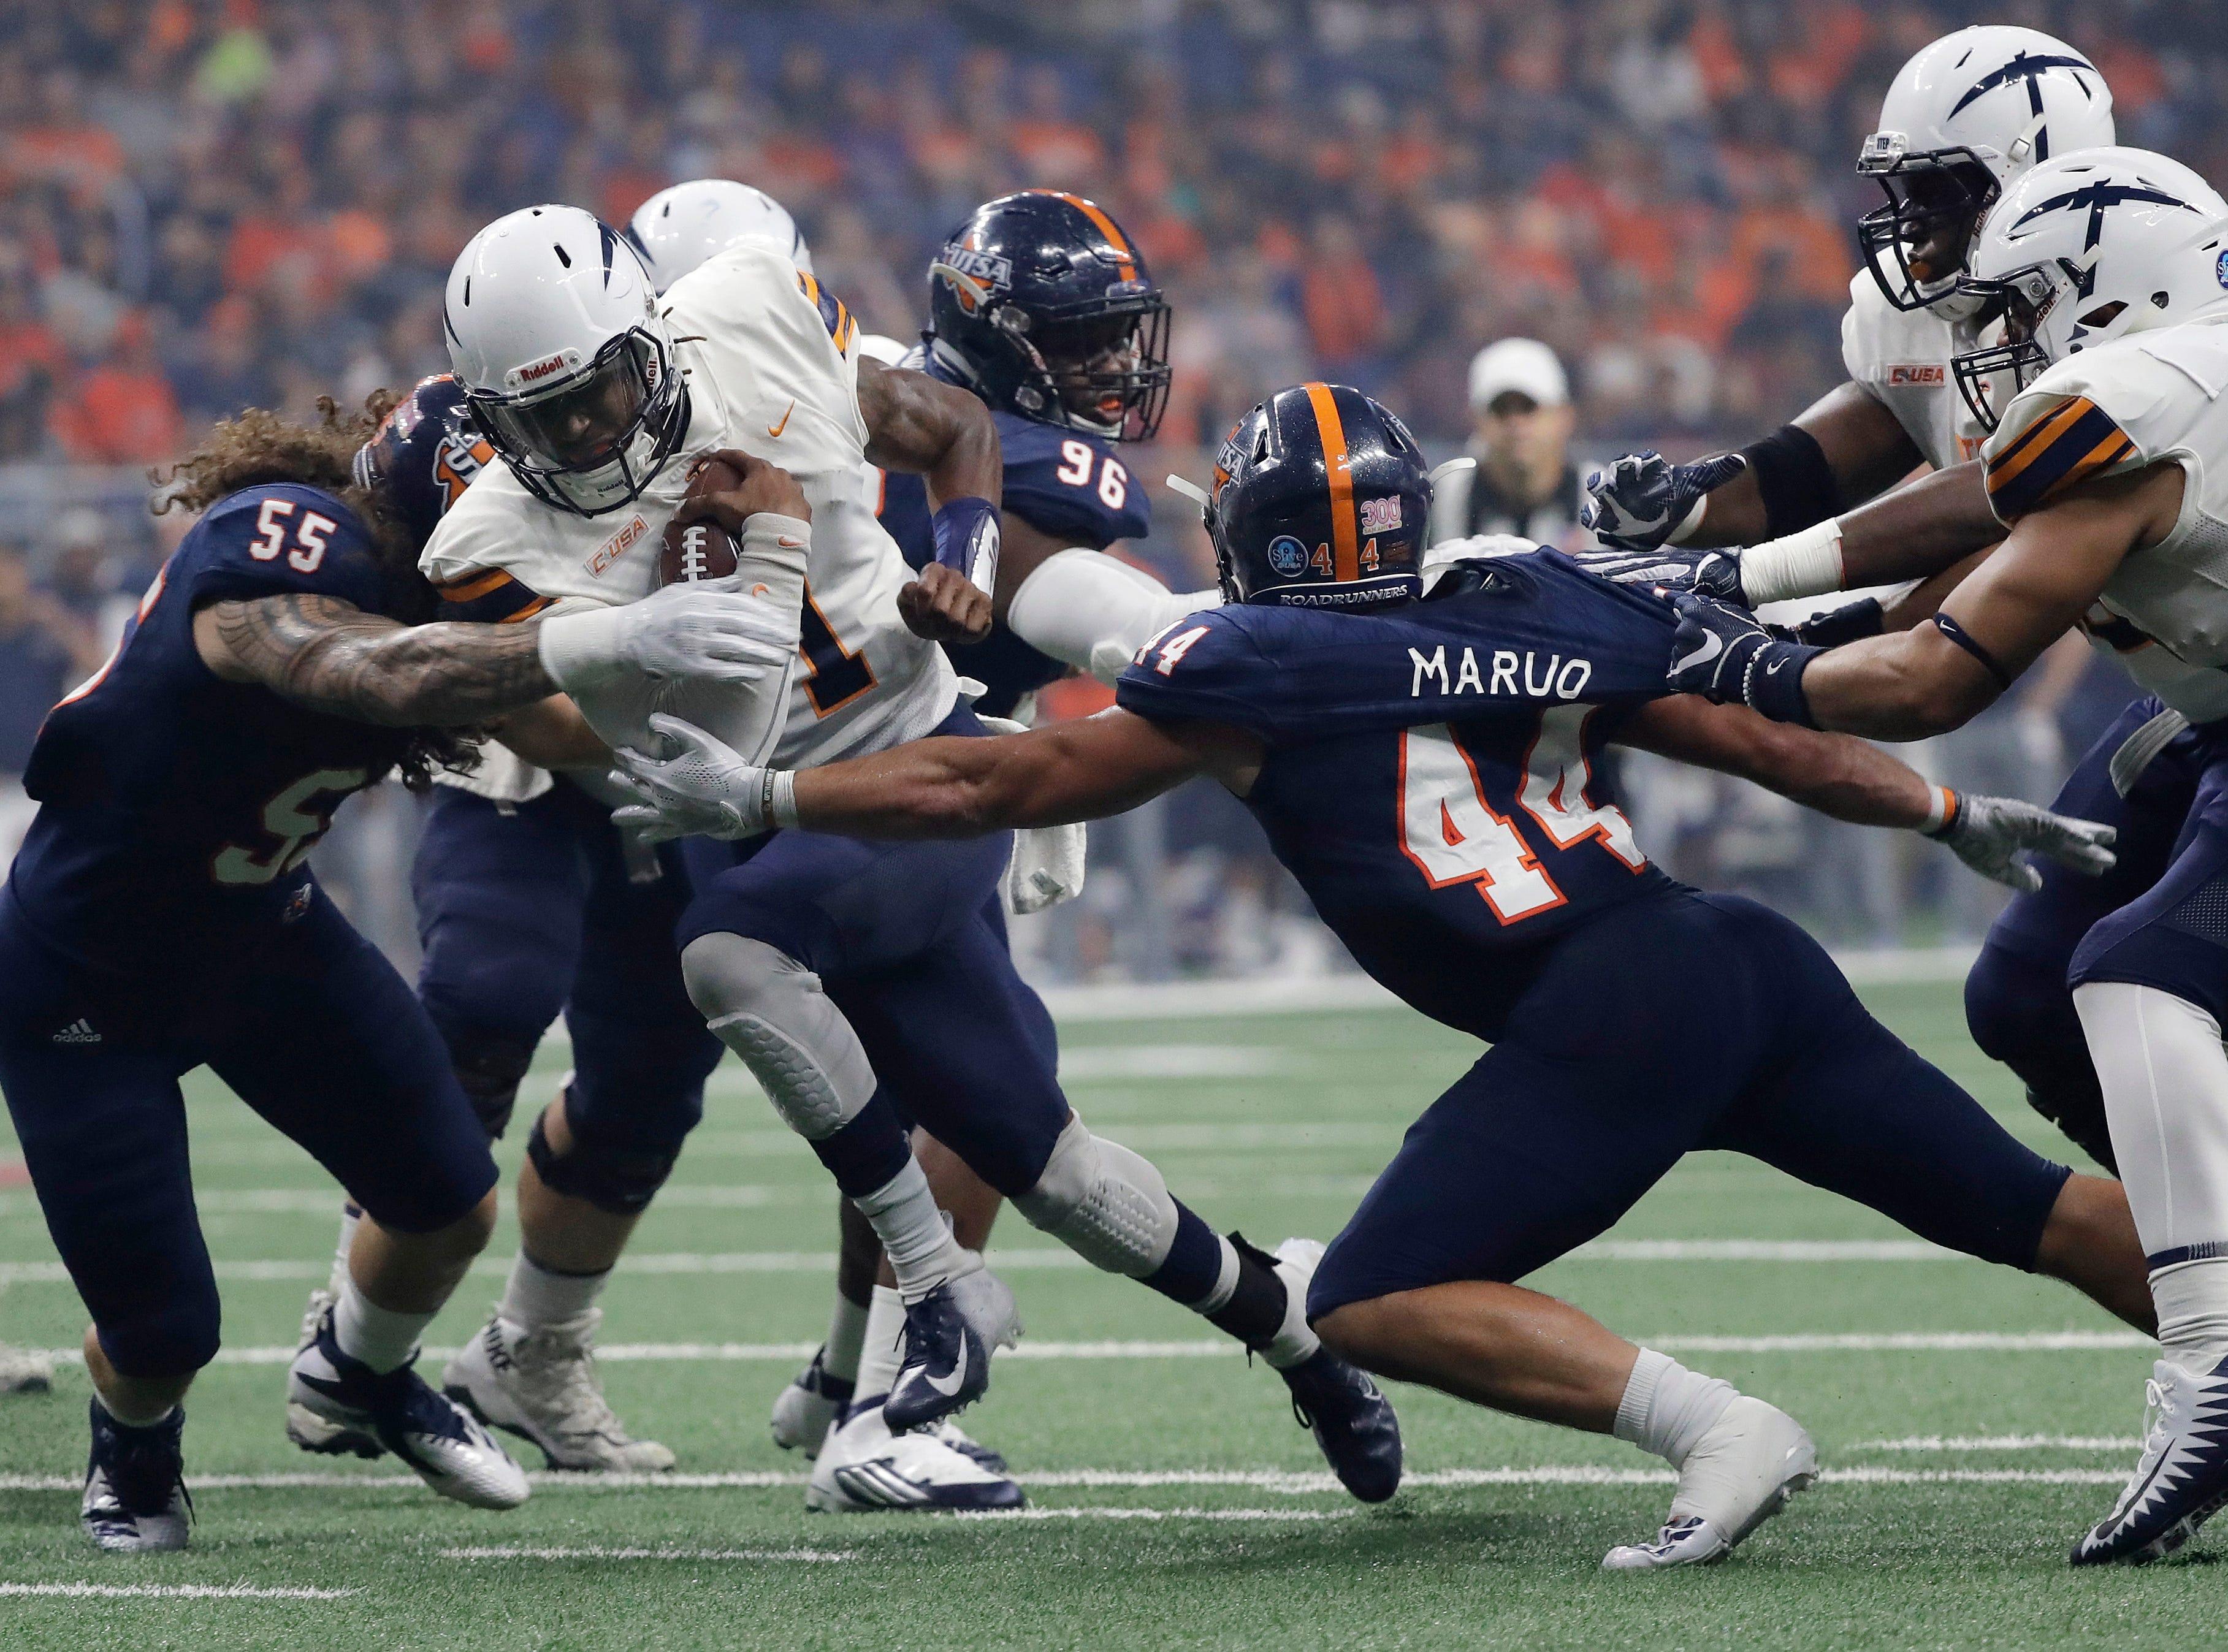 UTEP quarterback Kai Locksley (1) tries to run through UTSA defenders Josiah Tauaefa (55) and Les Maruo (44) during the first half of an NCAA college football game, Saturday, Sept. 29, 2018, in San Antonio. (AP Photo/Eric Gay)